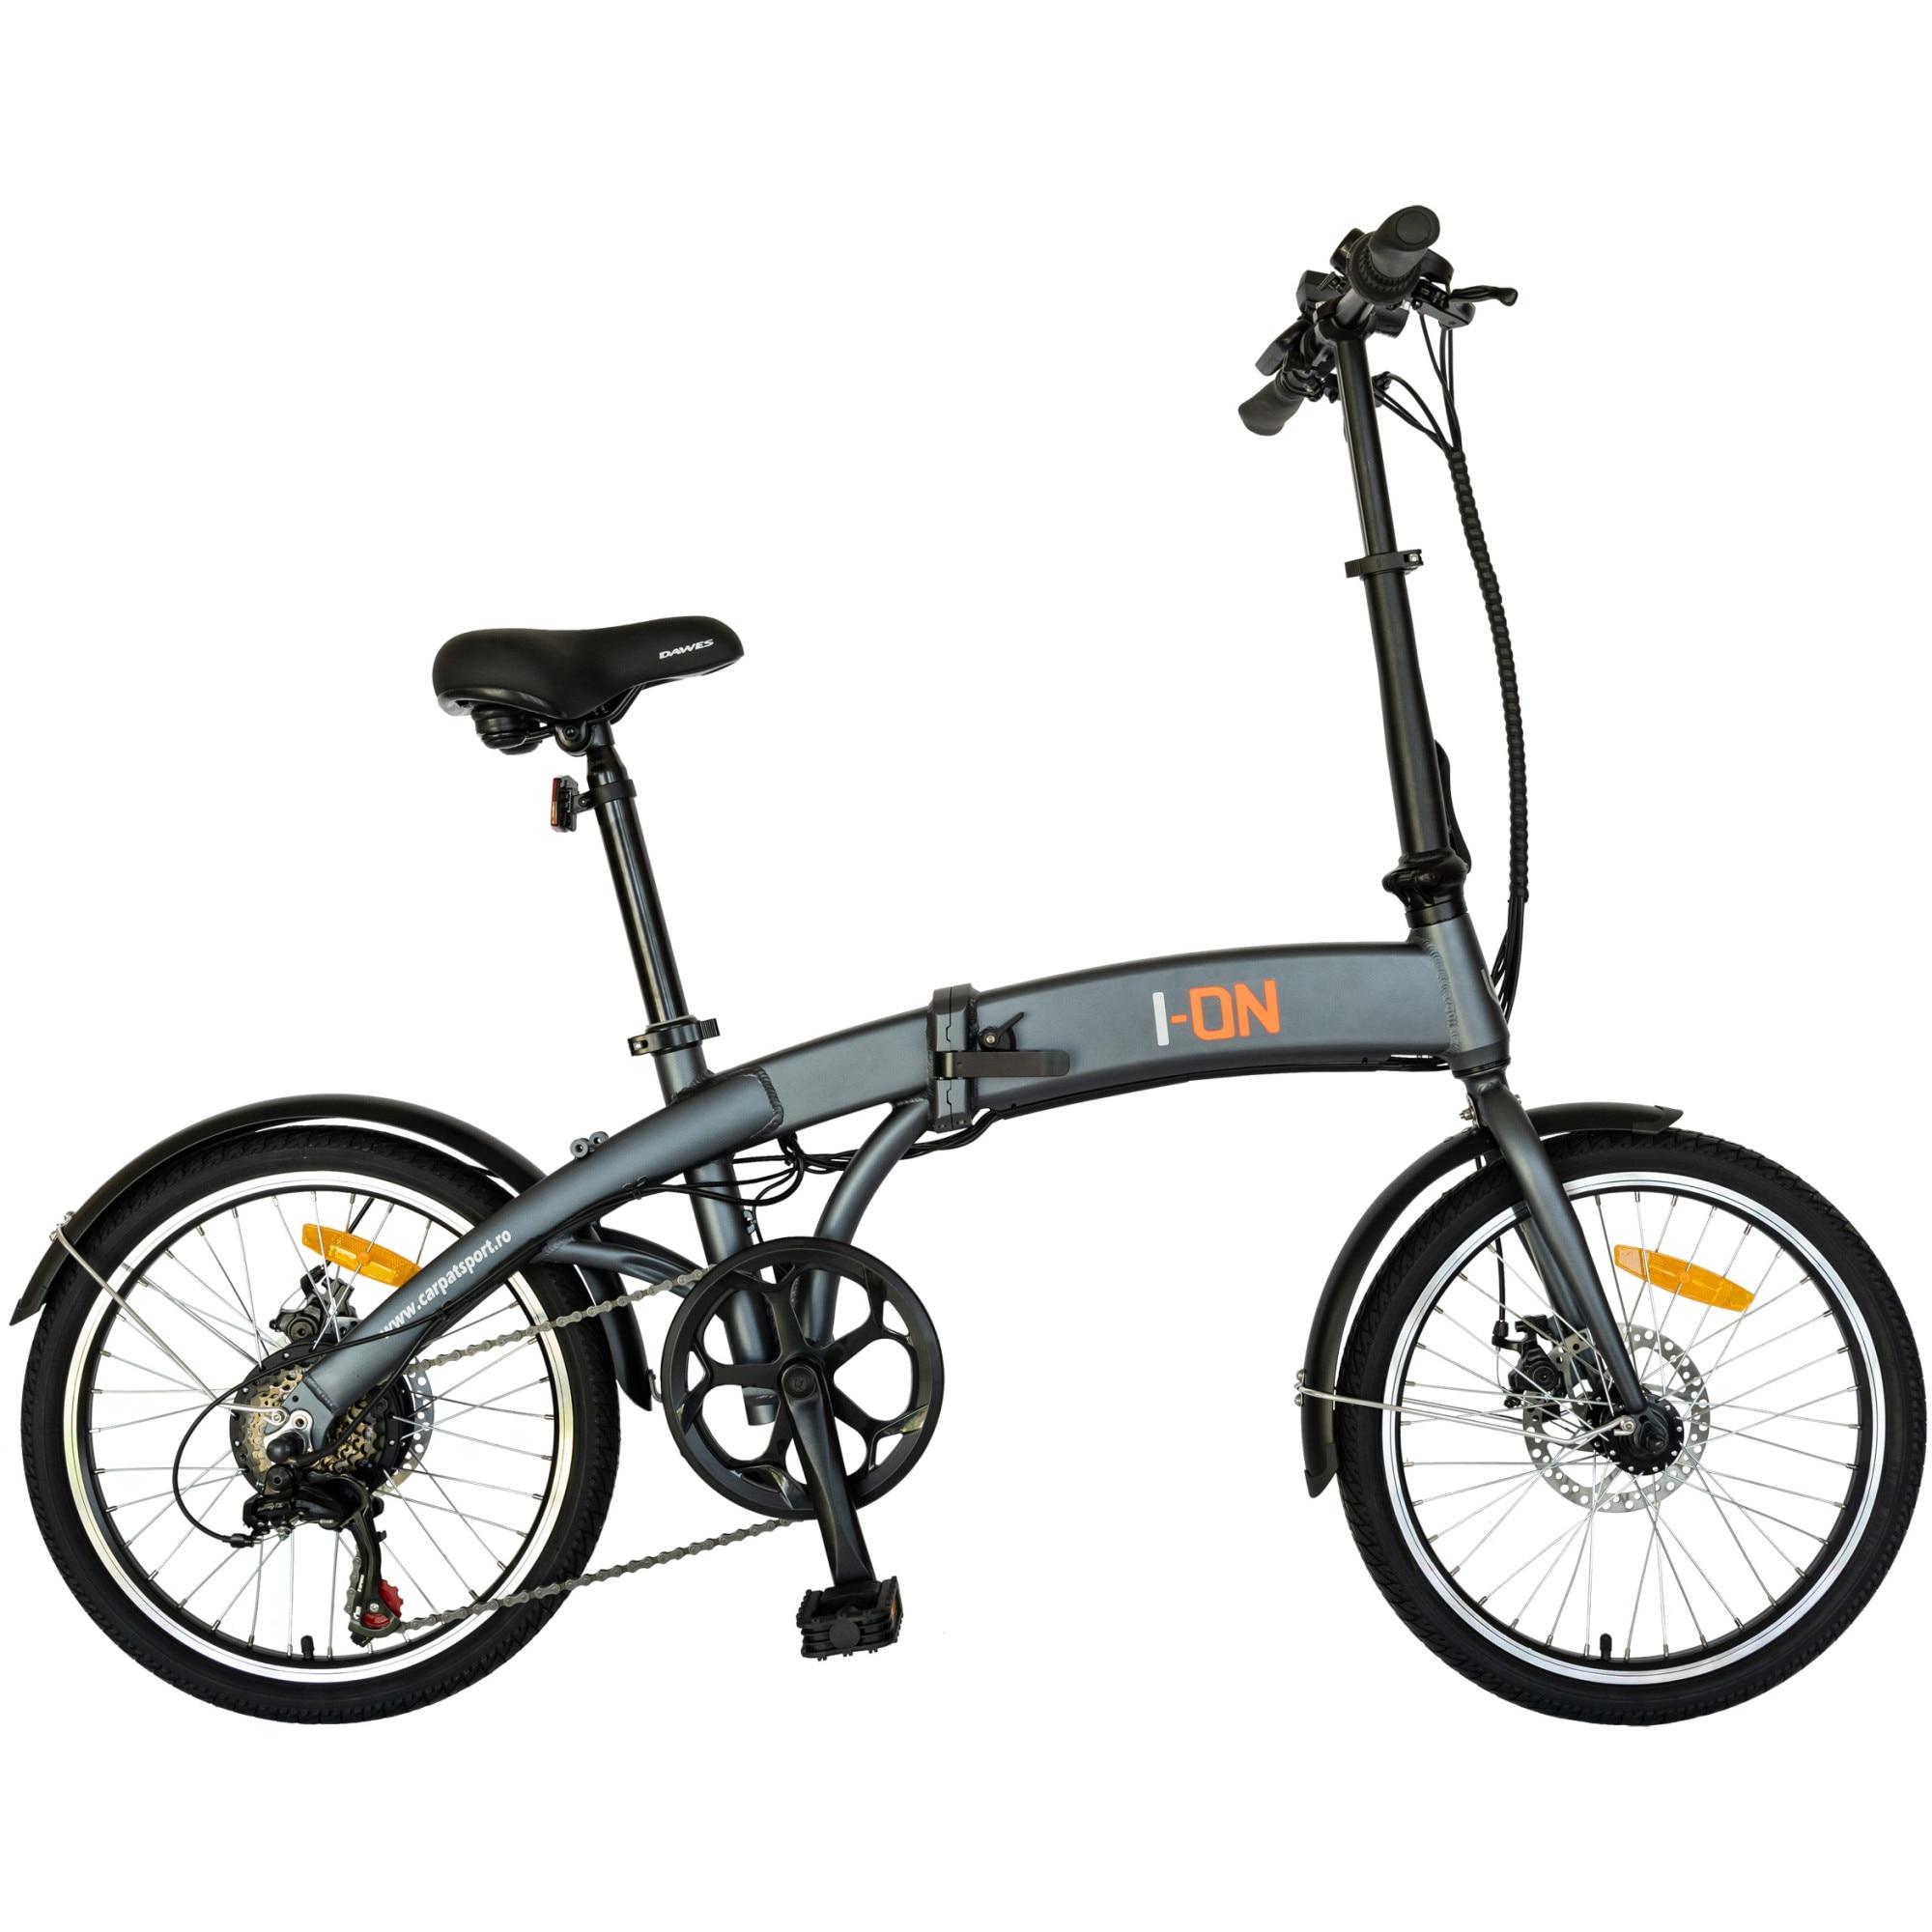 Fotografie Bicicleta Pliabila Electrica I-ON I1004E gri/portocaliu , 20 inch , Motor 36V, 250 W , Baterie Li-on 36V-6.6Ah